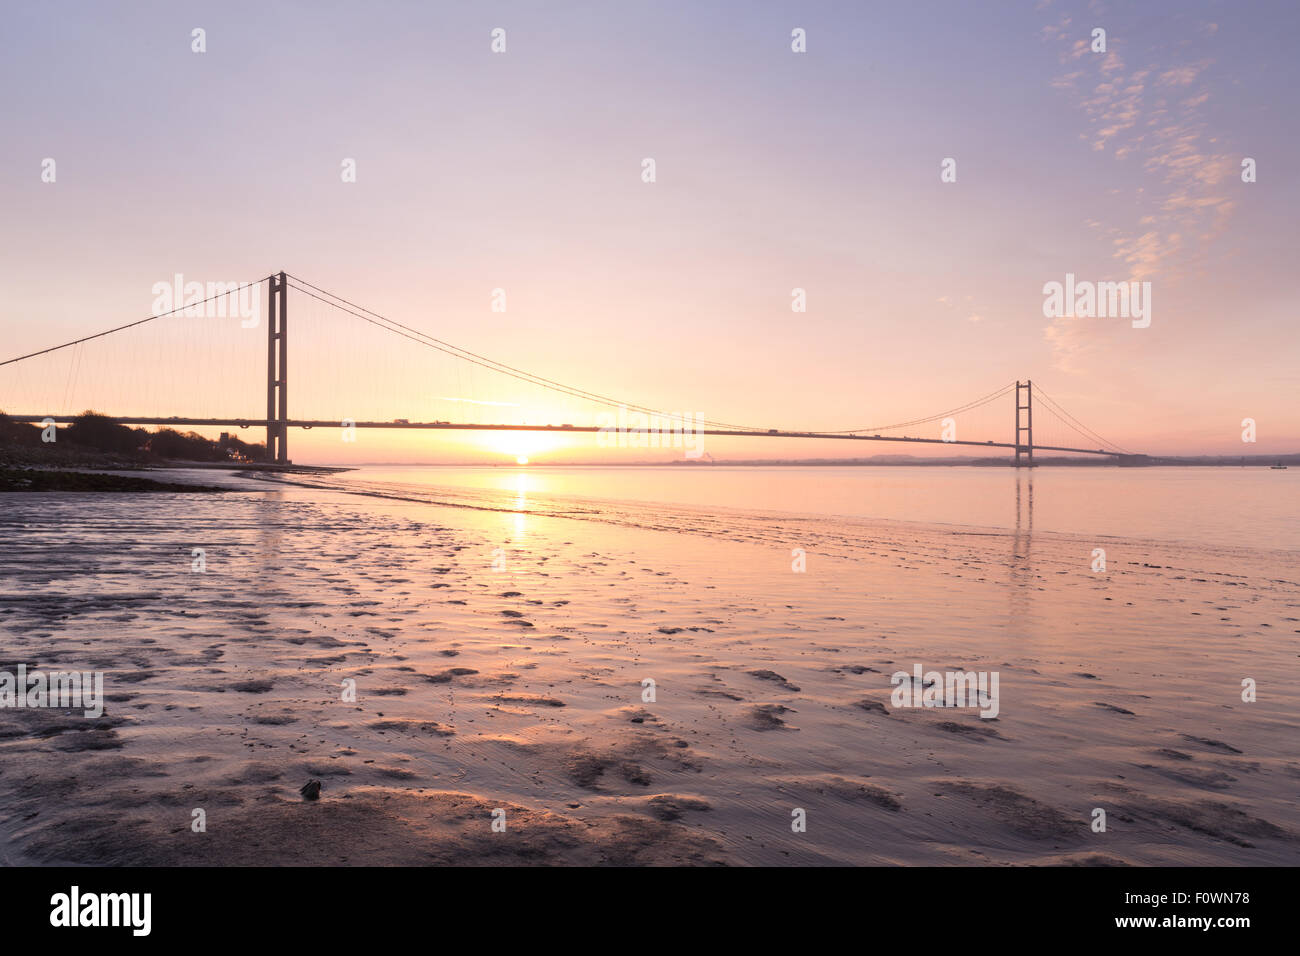 Humber Bridge, Hull to Barton Upon Humber - East Yorkshire, UK - Stock Image